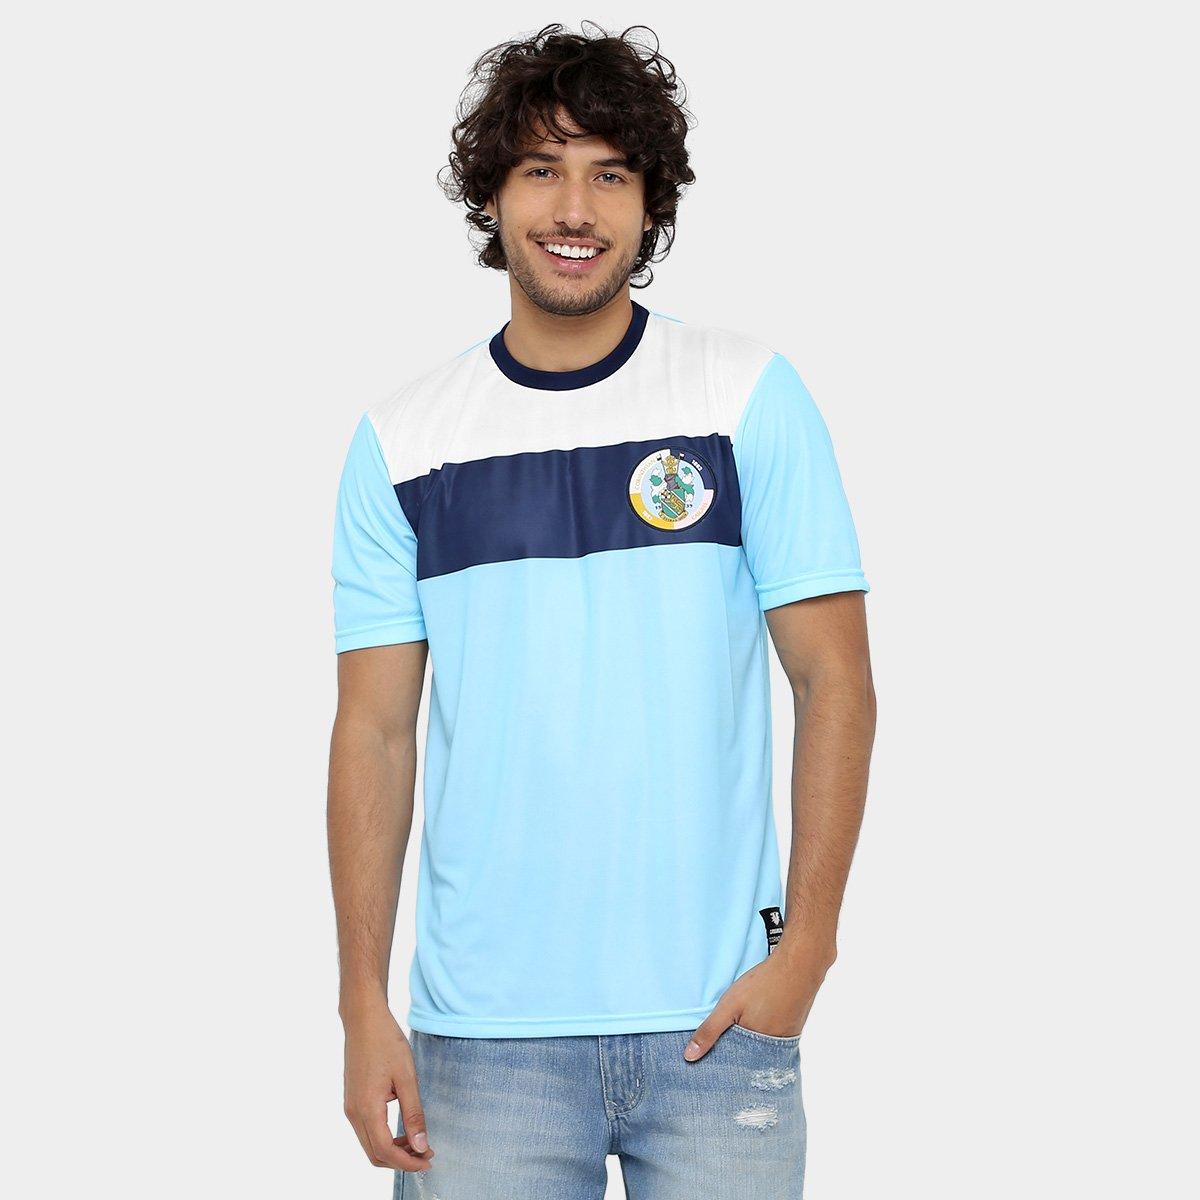 Camisa de Treino Corinthian-Casuals Masculina - Branco e Azul ... 67979e49c9f4c